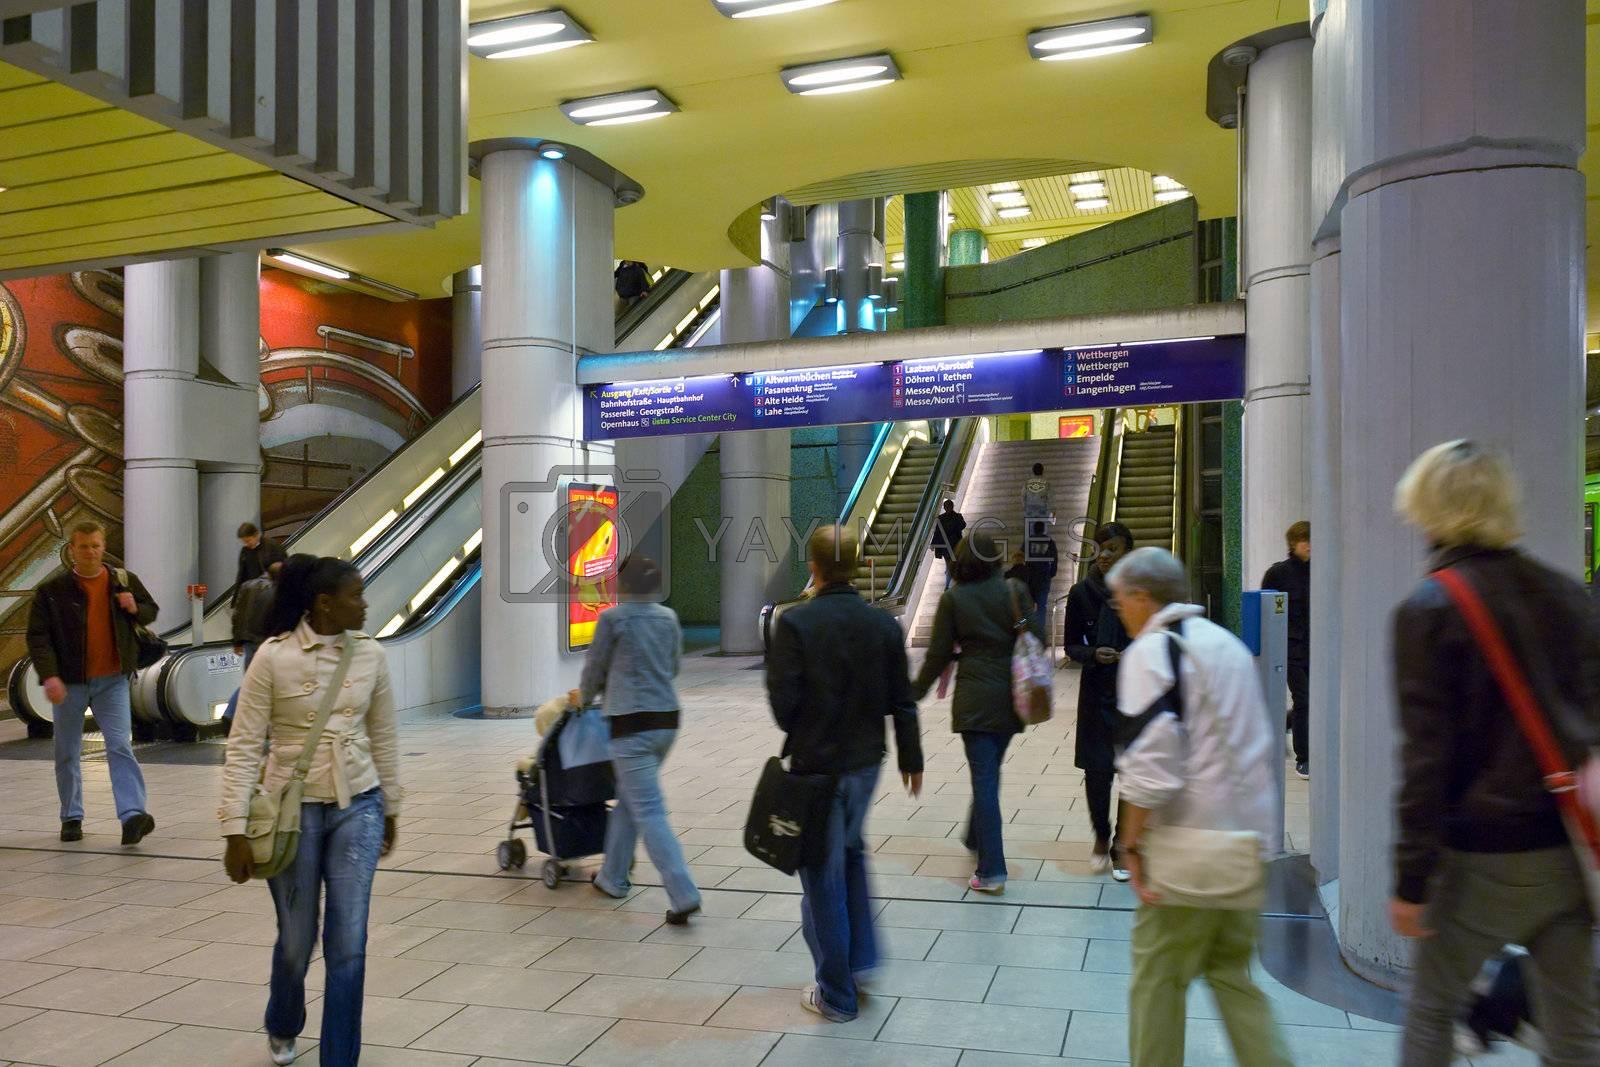 Subway station Kröpcke of Hanover, Germany